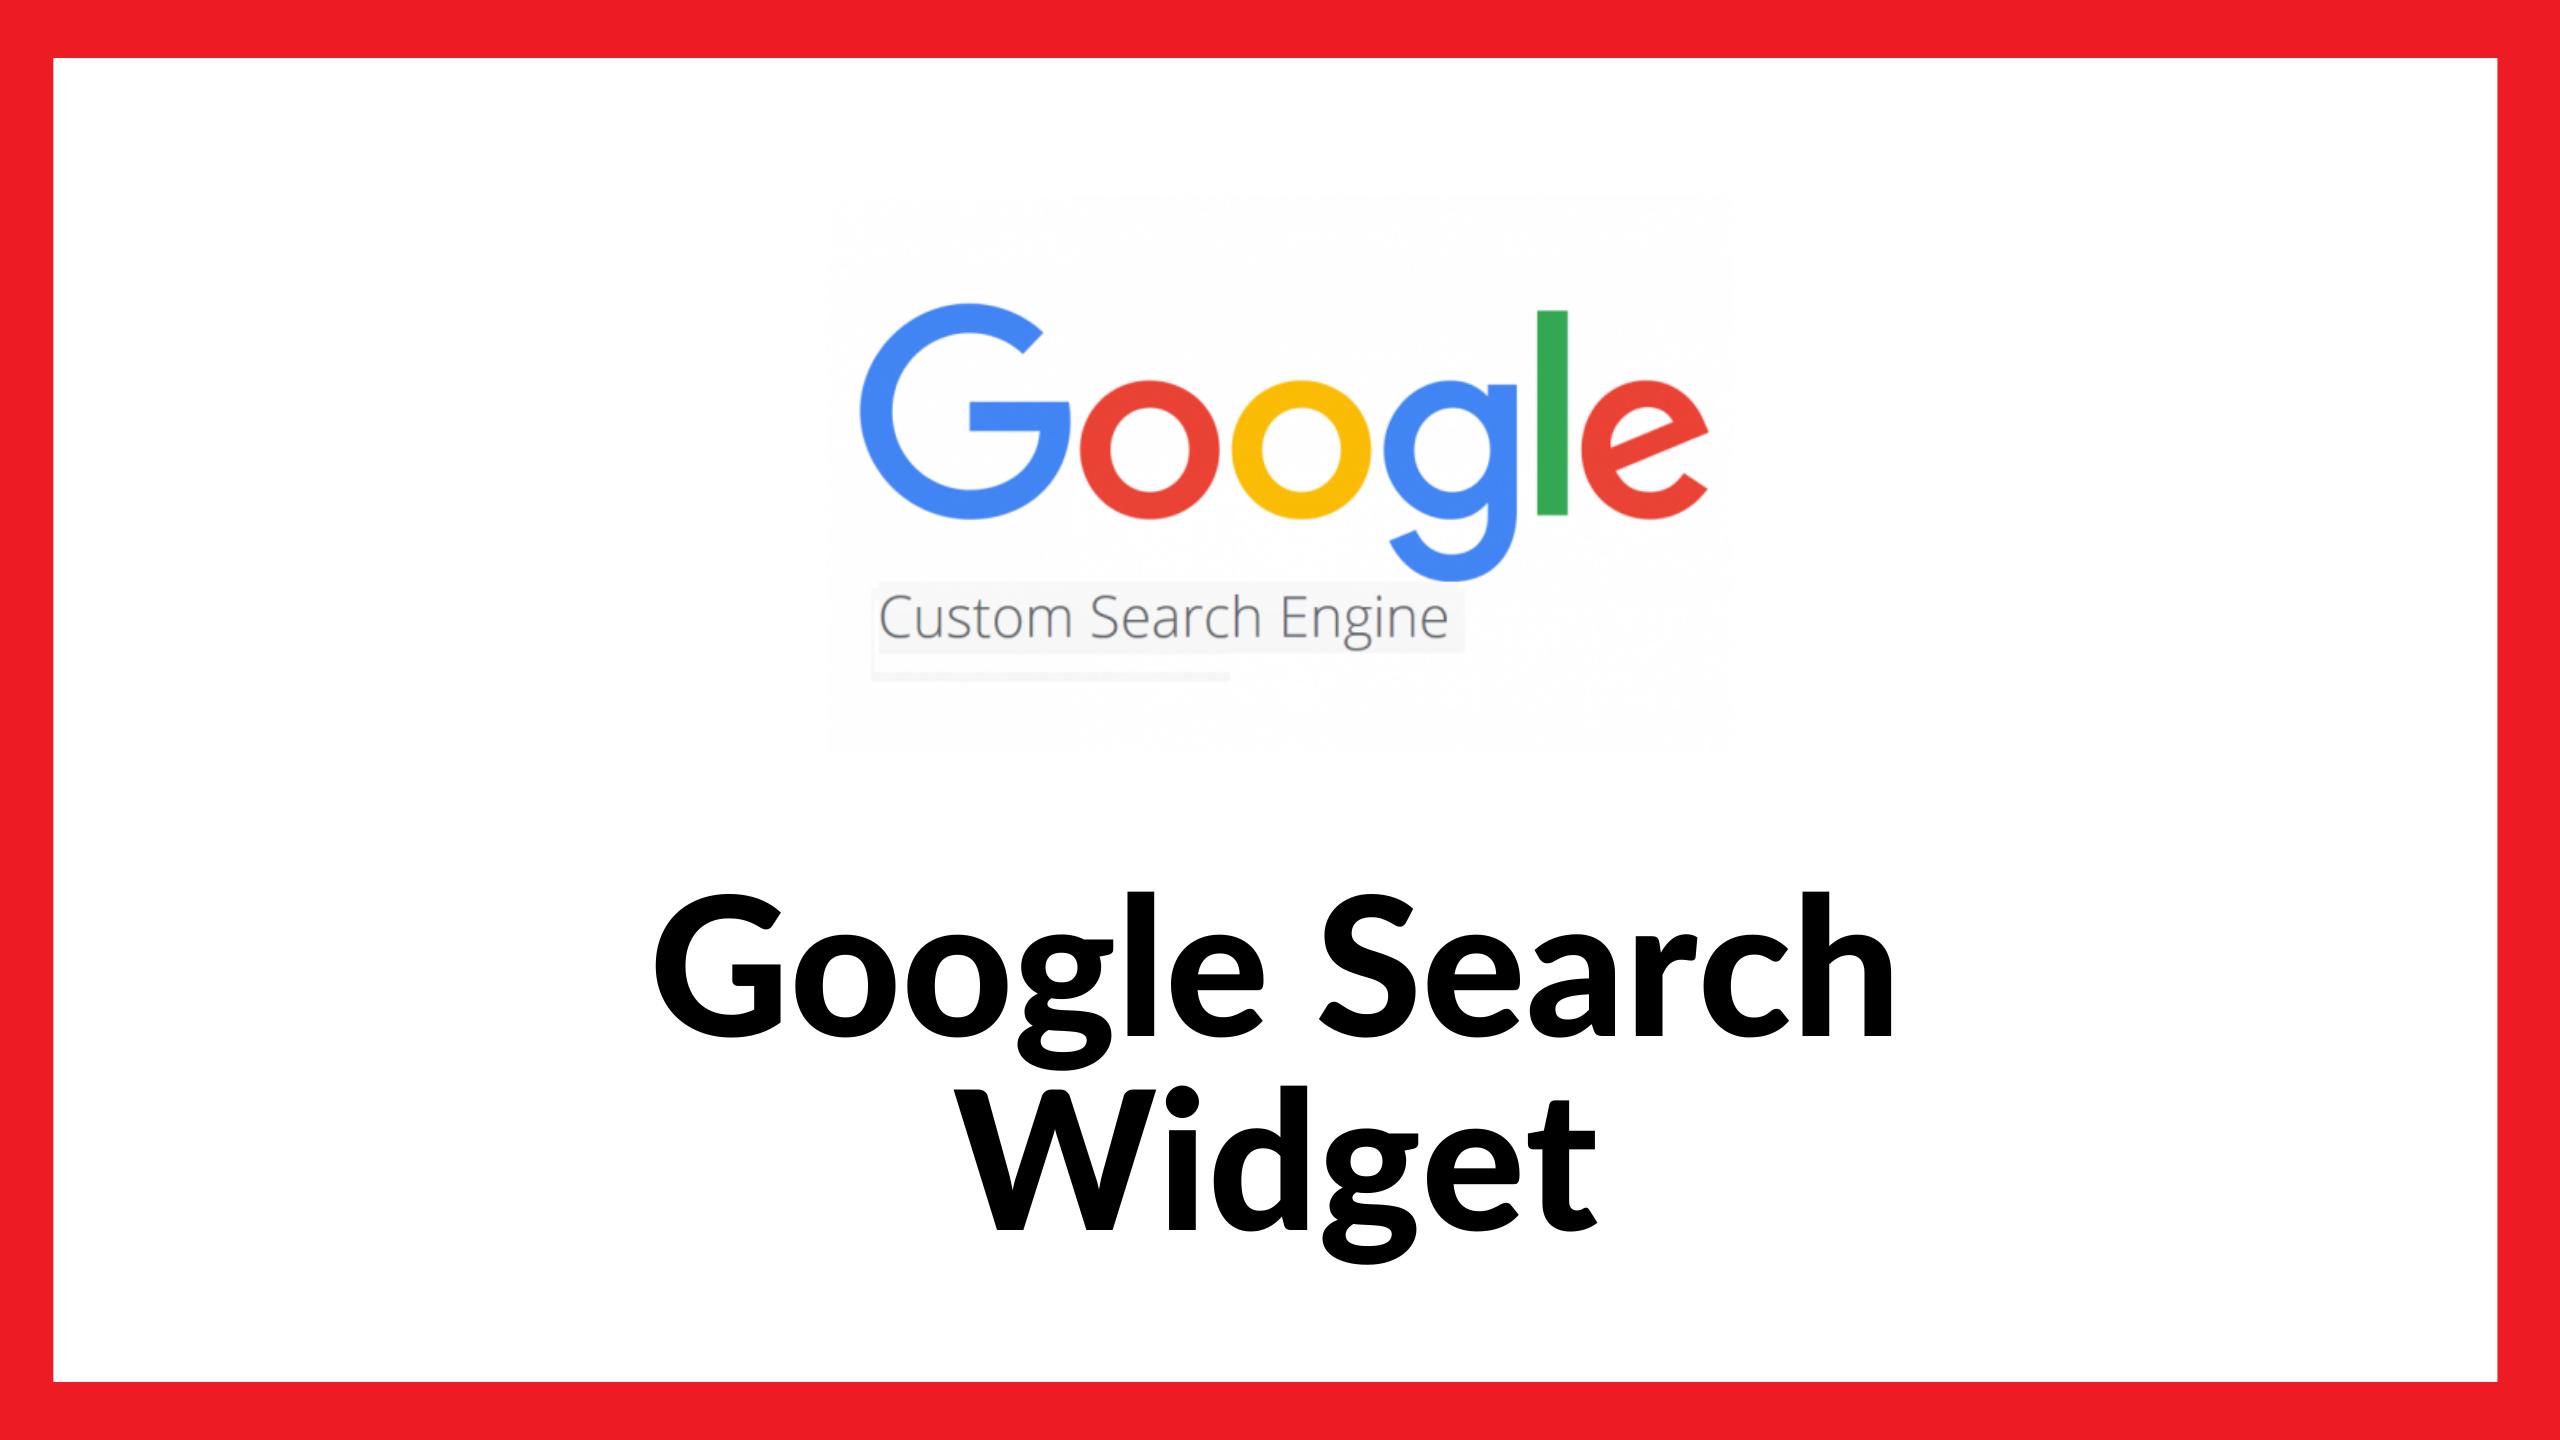 Google Search Widget for Website